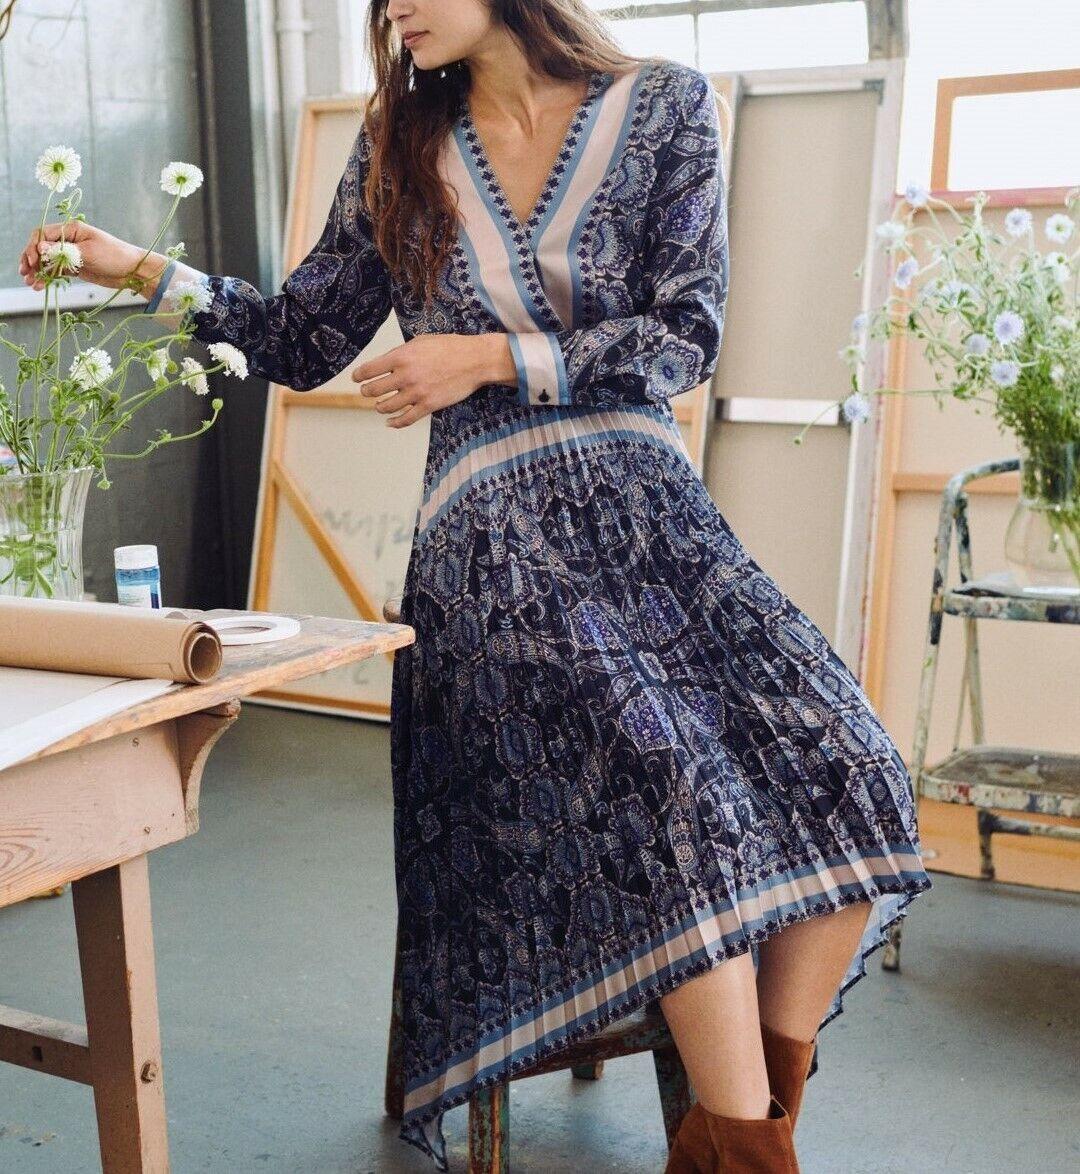 Dark Blau Paisley Patterned Pleated Dress Paisleymuster Plissiertes Plissiertes Plissiertes Kleid H&M   Abrechnungspreis     Neuer Markt    Shop Düsseldorf  9a1b0e